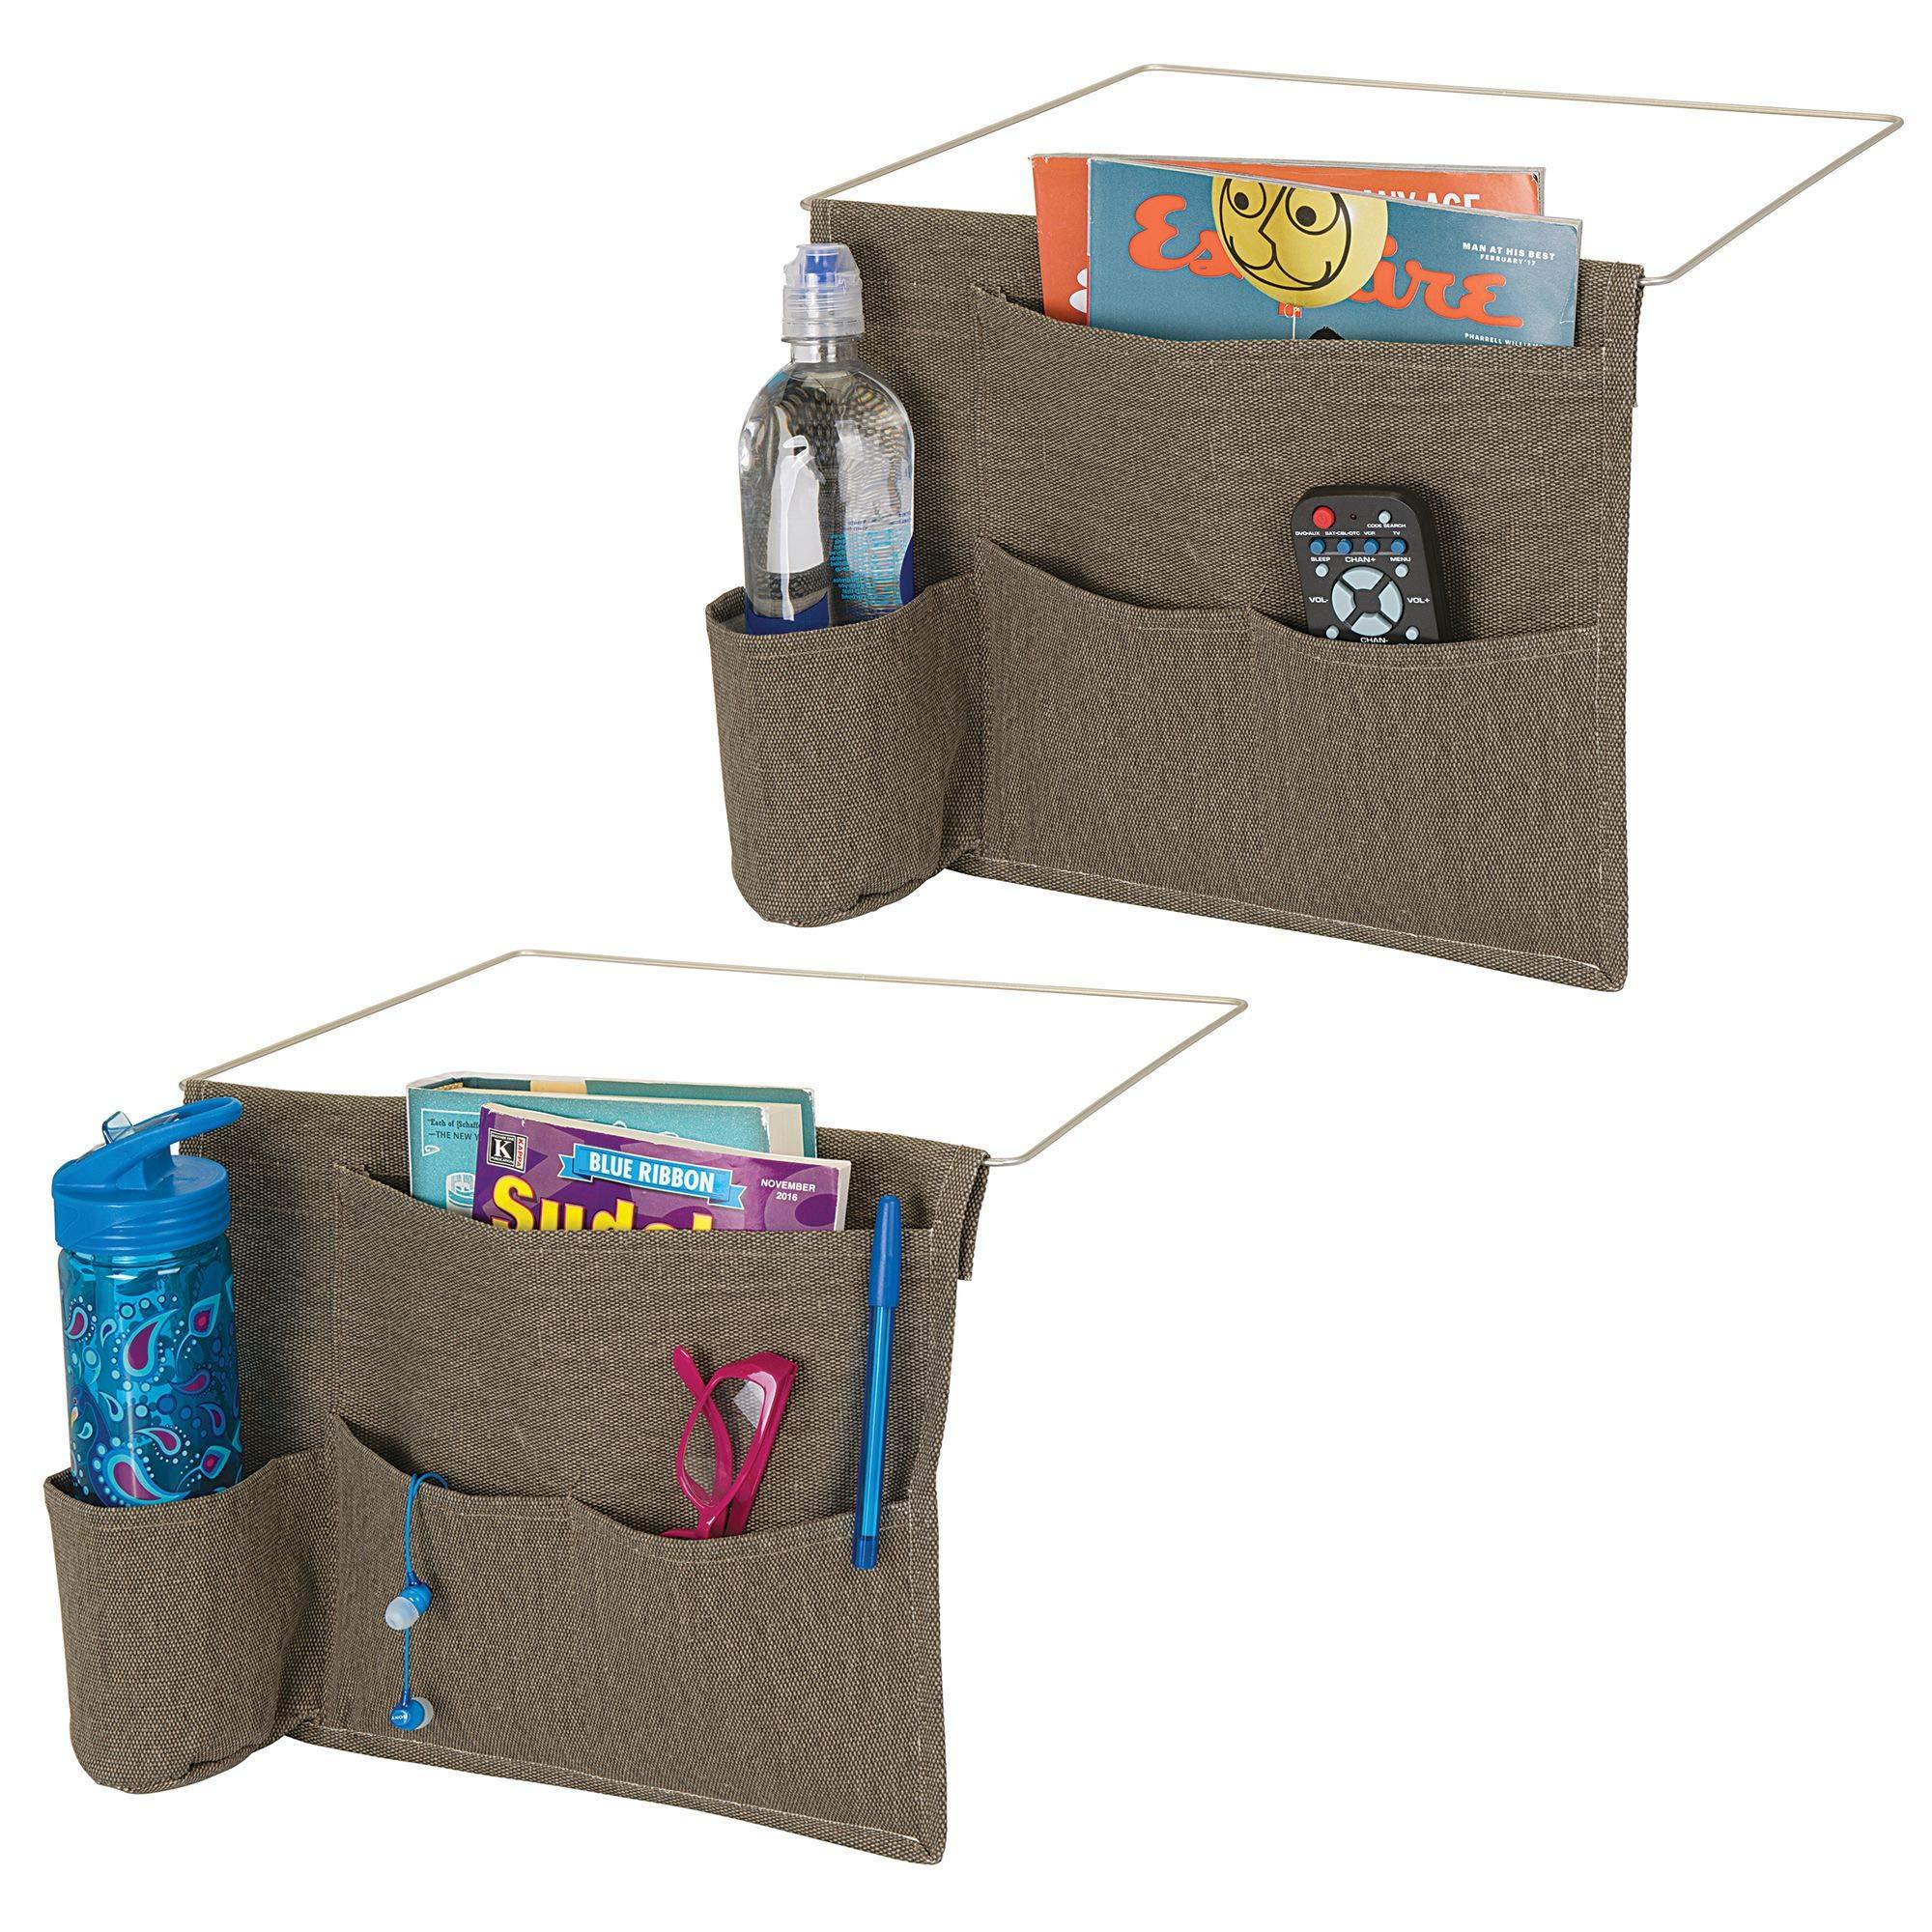 mDesign Bedside Storage Organizer Caddy Pocket - Slim Space Saving Design, 4 Pockets - Heavy Cotton Canvas - Holds Water Bottles, Books, Magazines - Pack of 2, Espresso/Wire Insert in Matte Satin